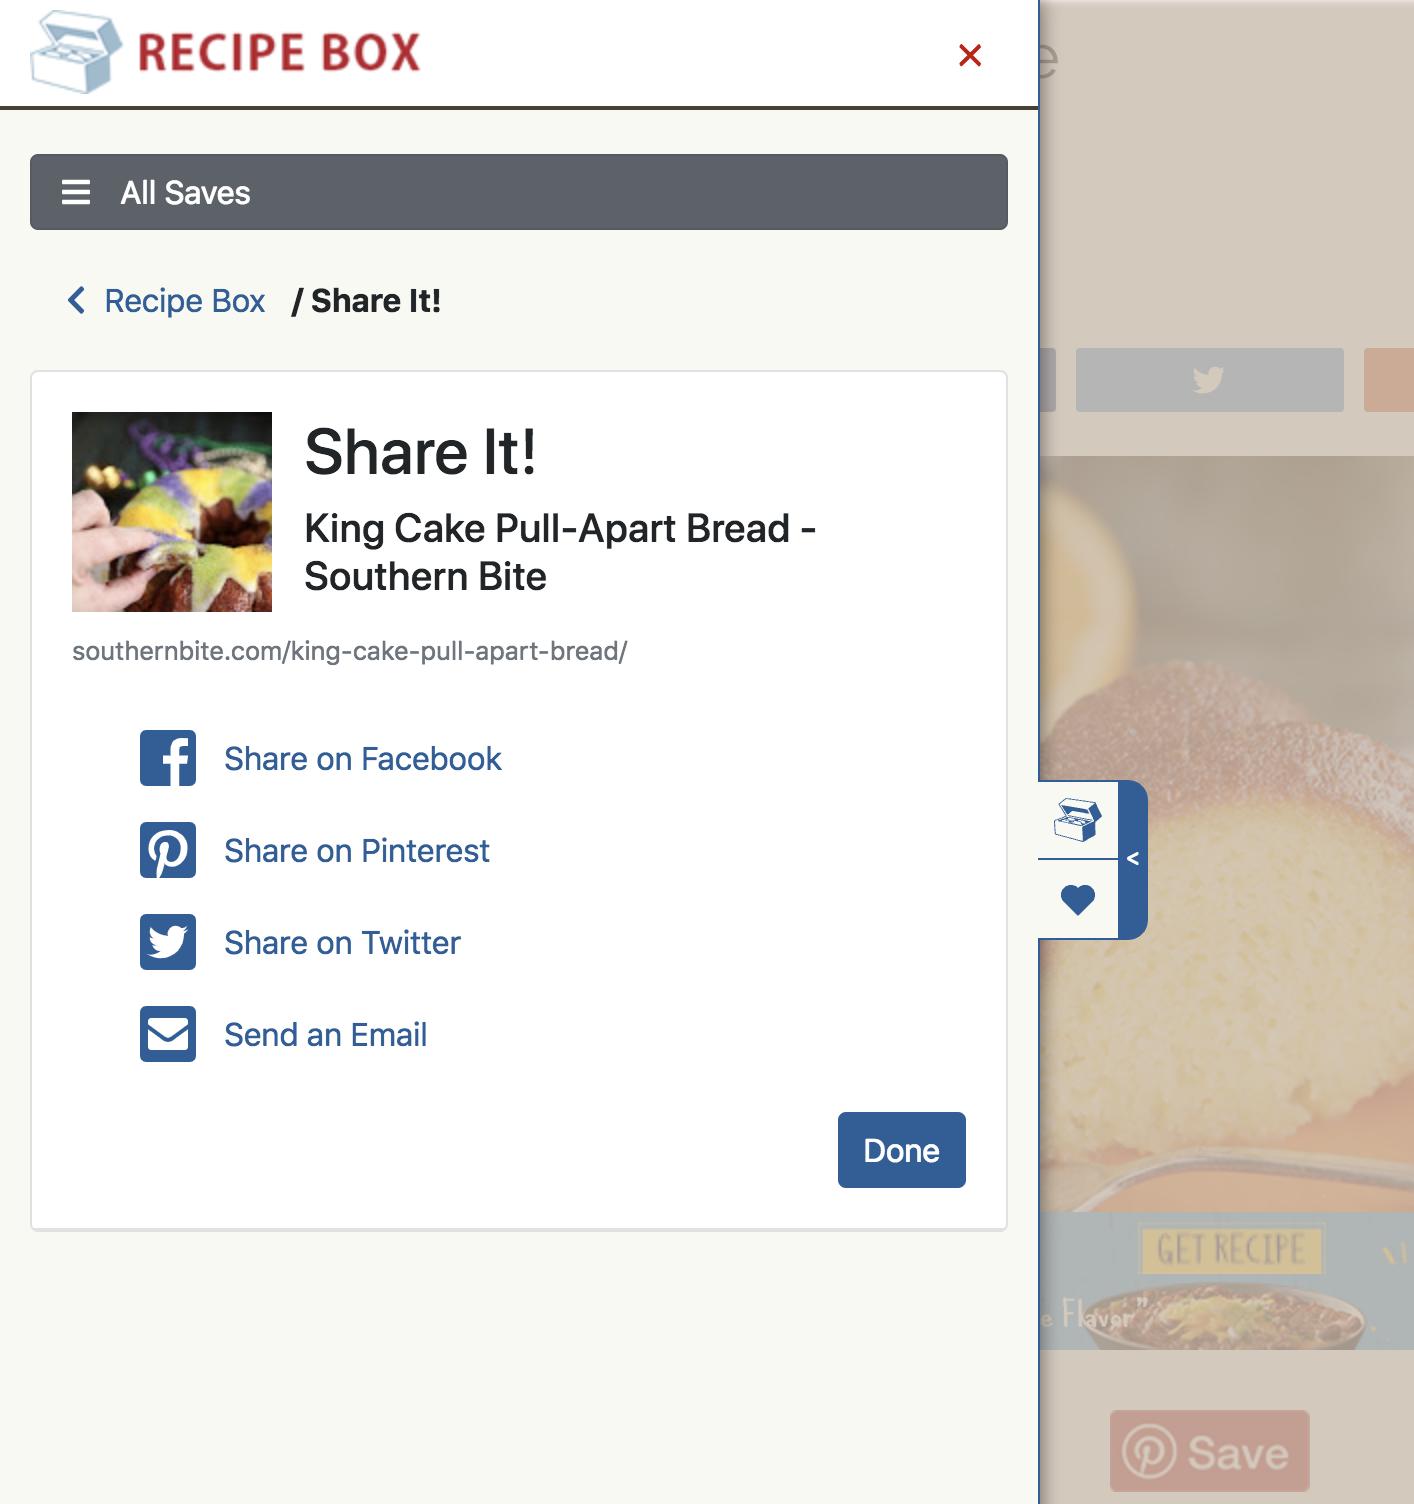 Organize recipes into custom folders.